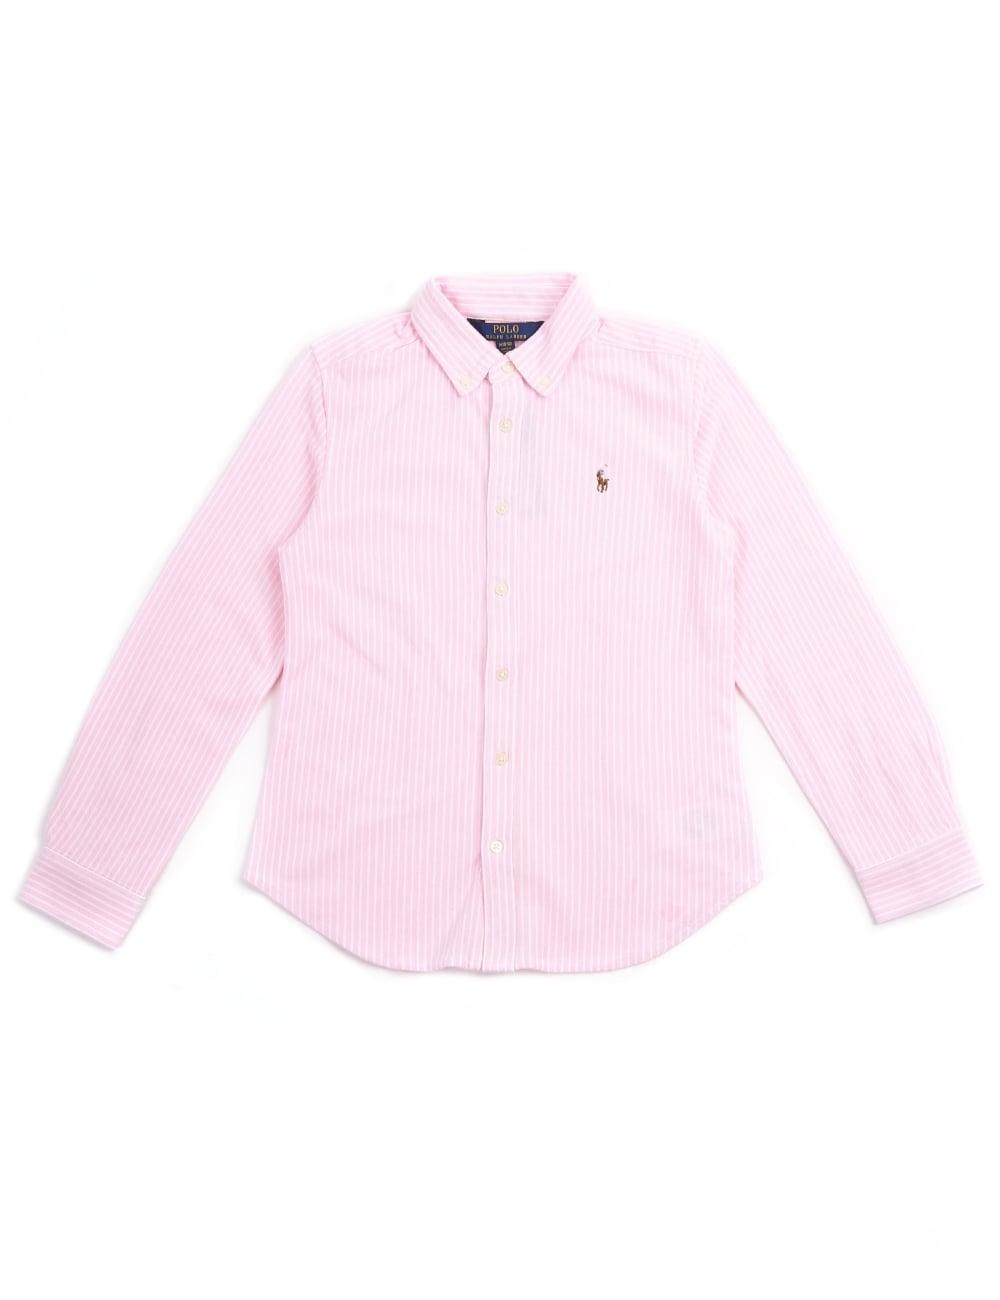 44ade8a74 Polo Ralph Lauren Youth Girls Striped Long Sleeve Shirt